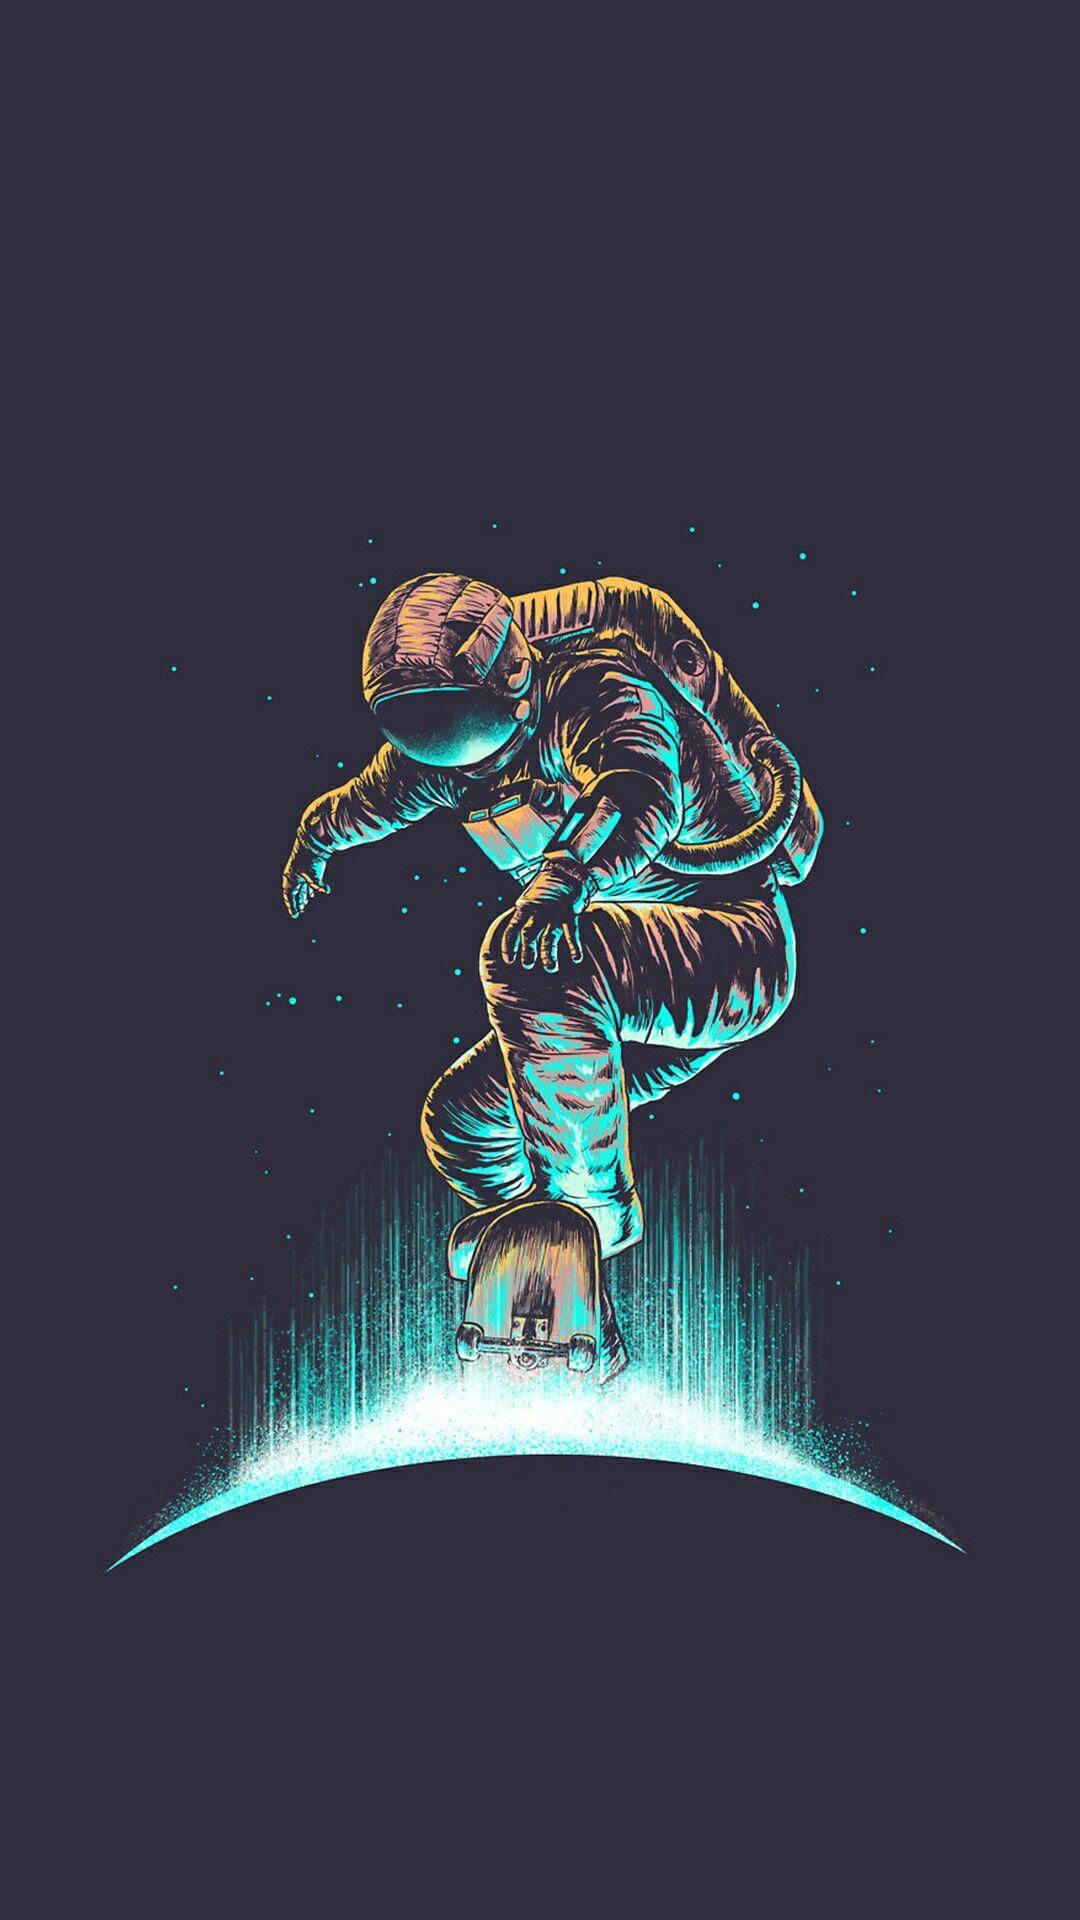 Skateboarding astronaut Astronaut art, Astronaut